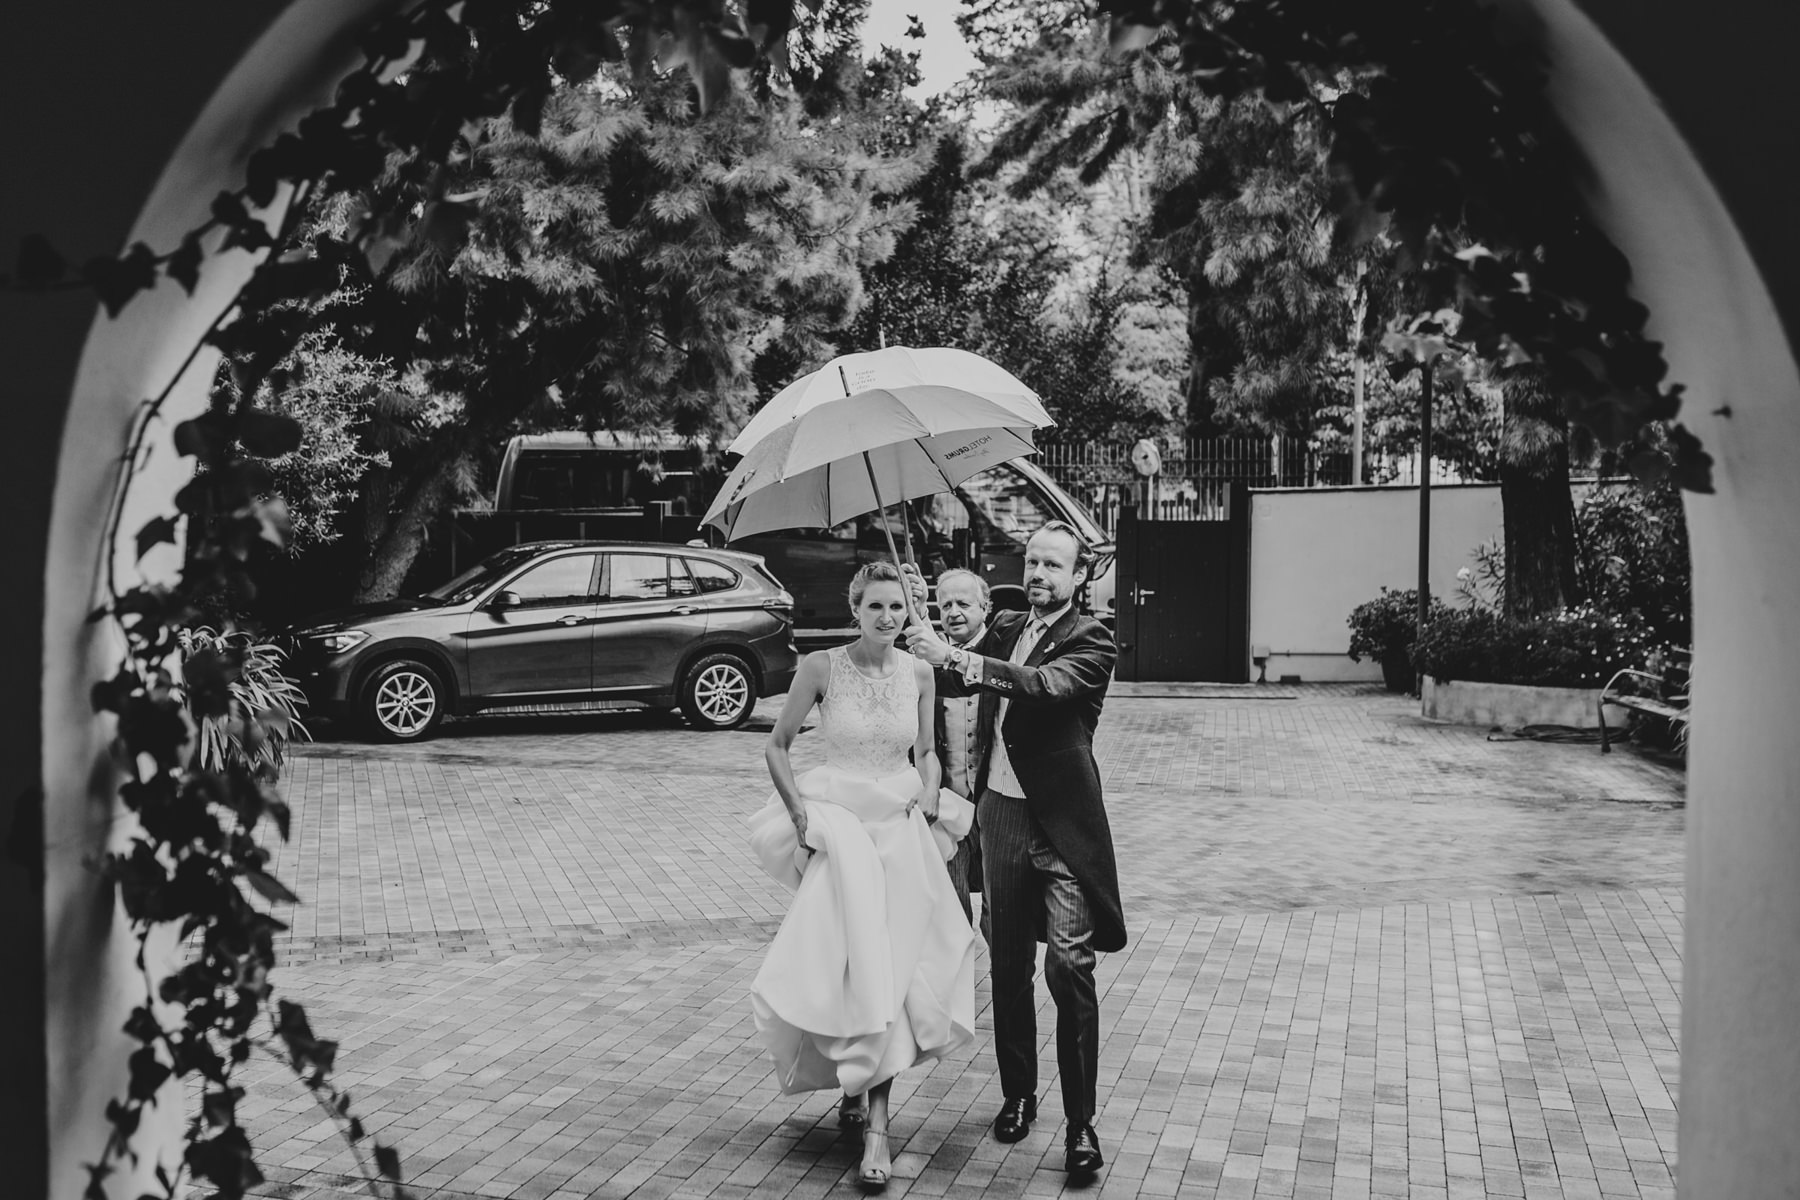 Wedding_Photography_Carlos_Hevia_Barcelona_Berlin_6.jpg